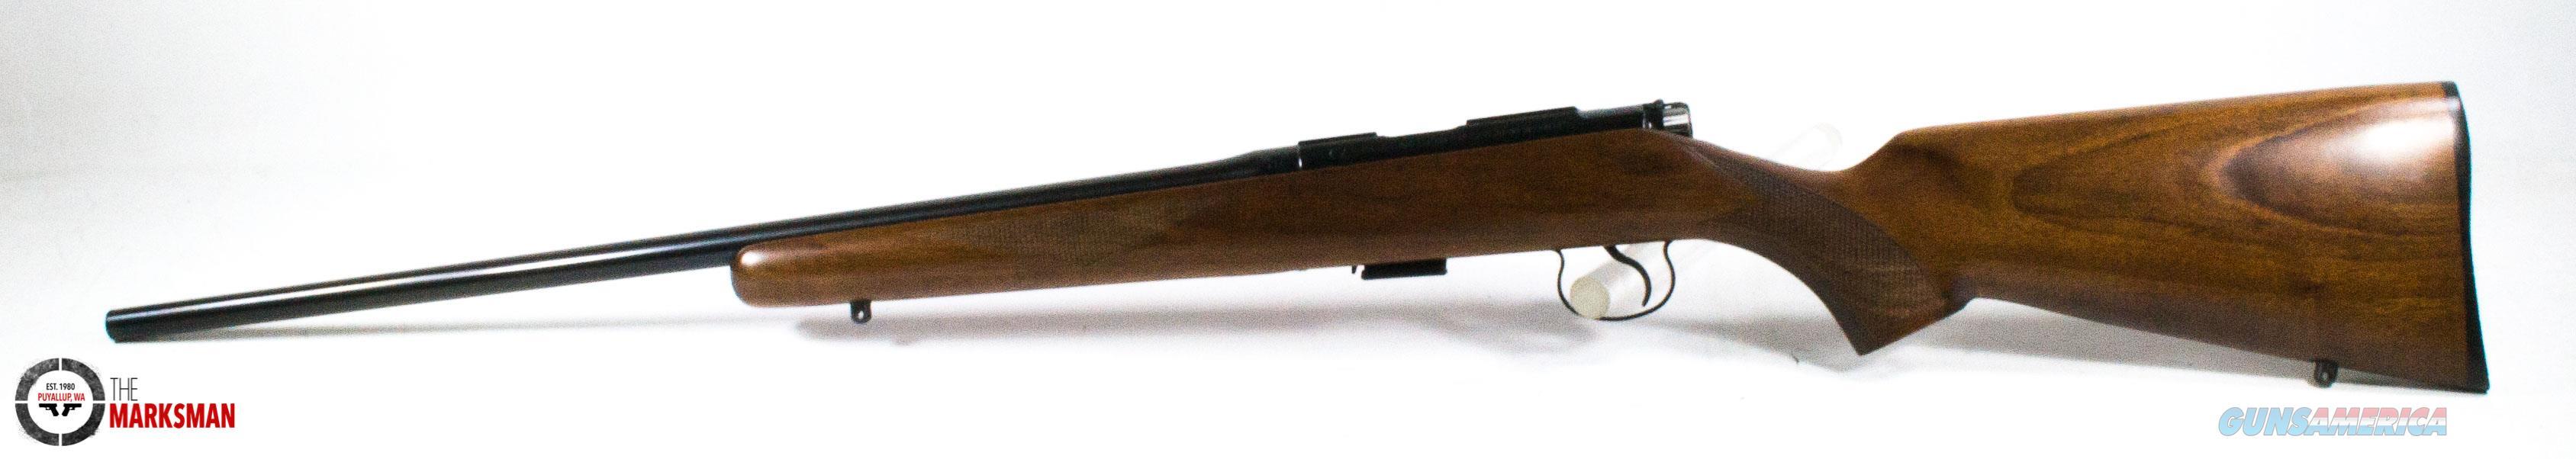 CZ 452 American, .22 LR   Guns > Rifles > CZ Rifles